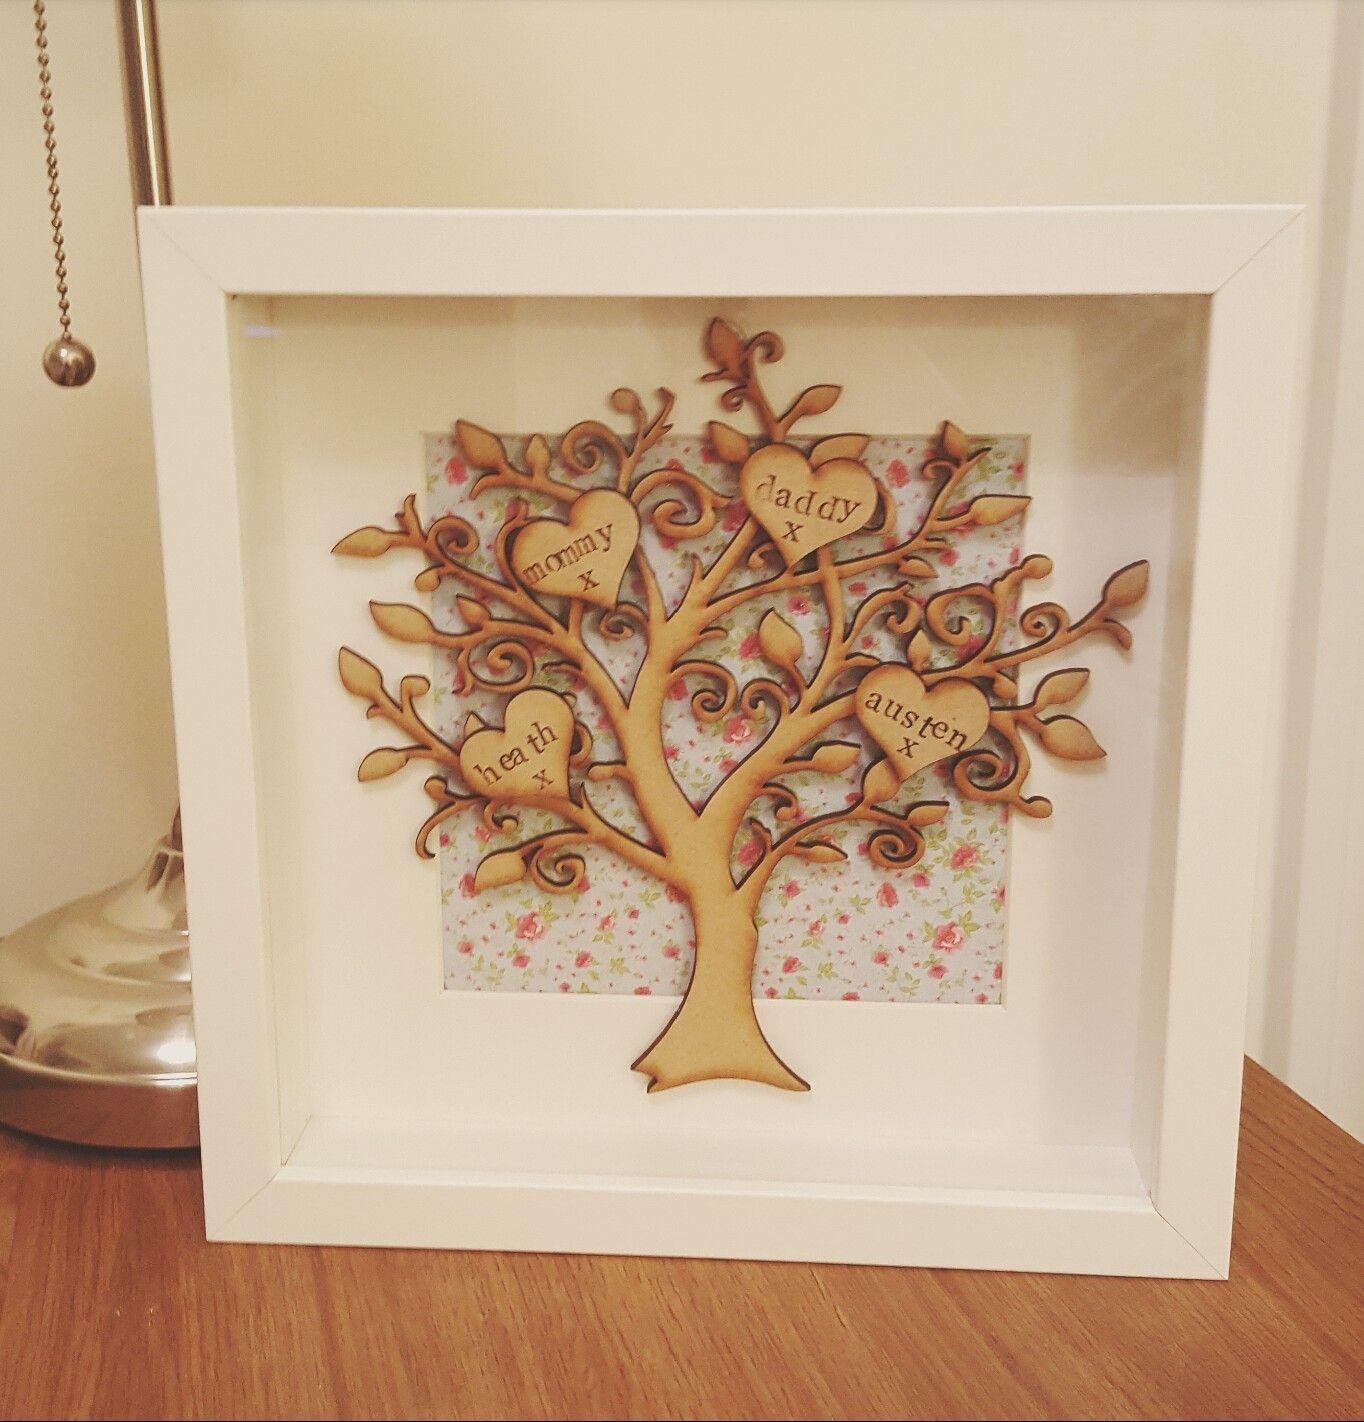 Family tree frame Find us on Facebook @willowboxframes | Hobbi ...